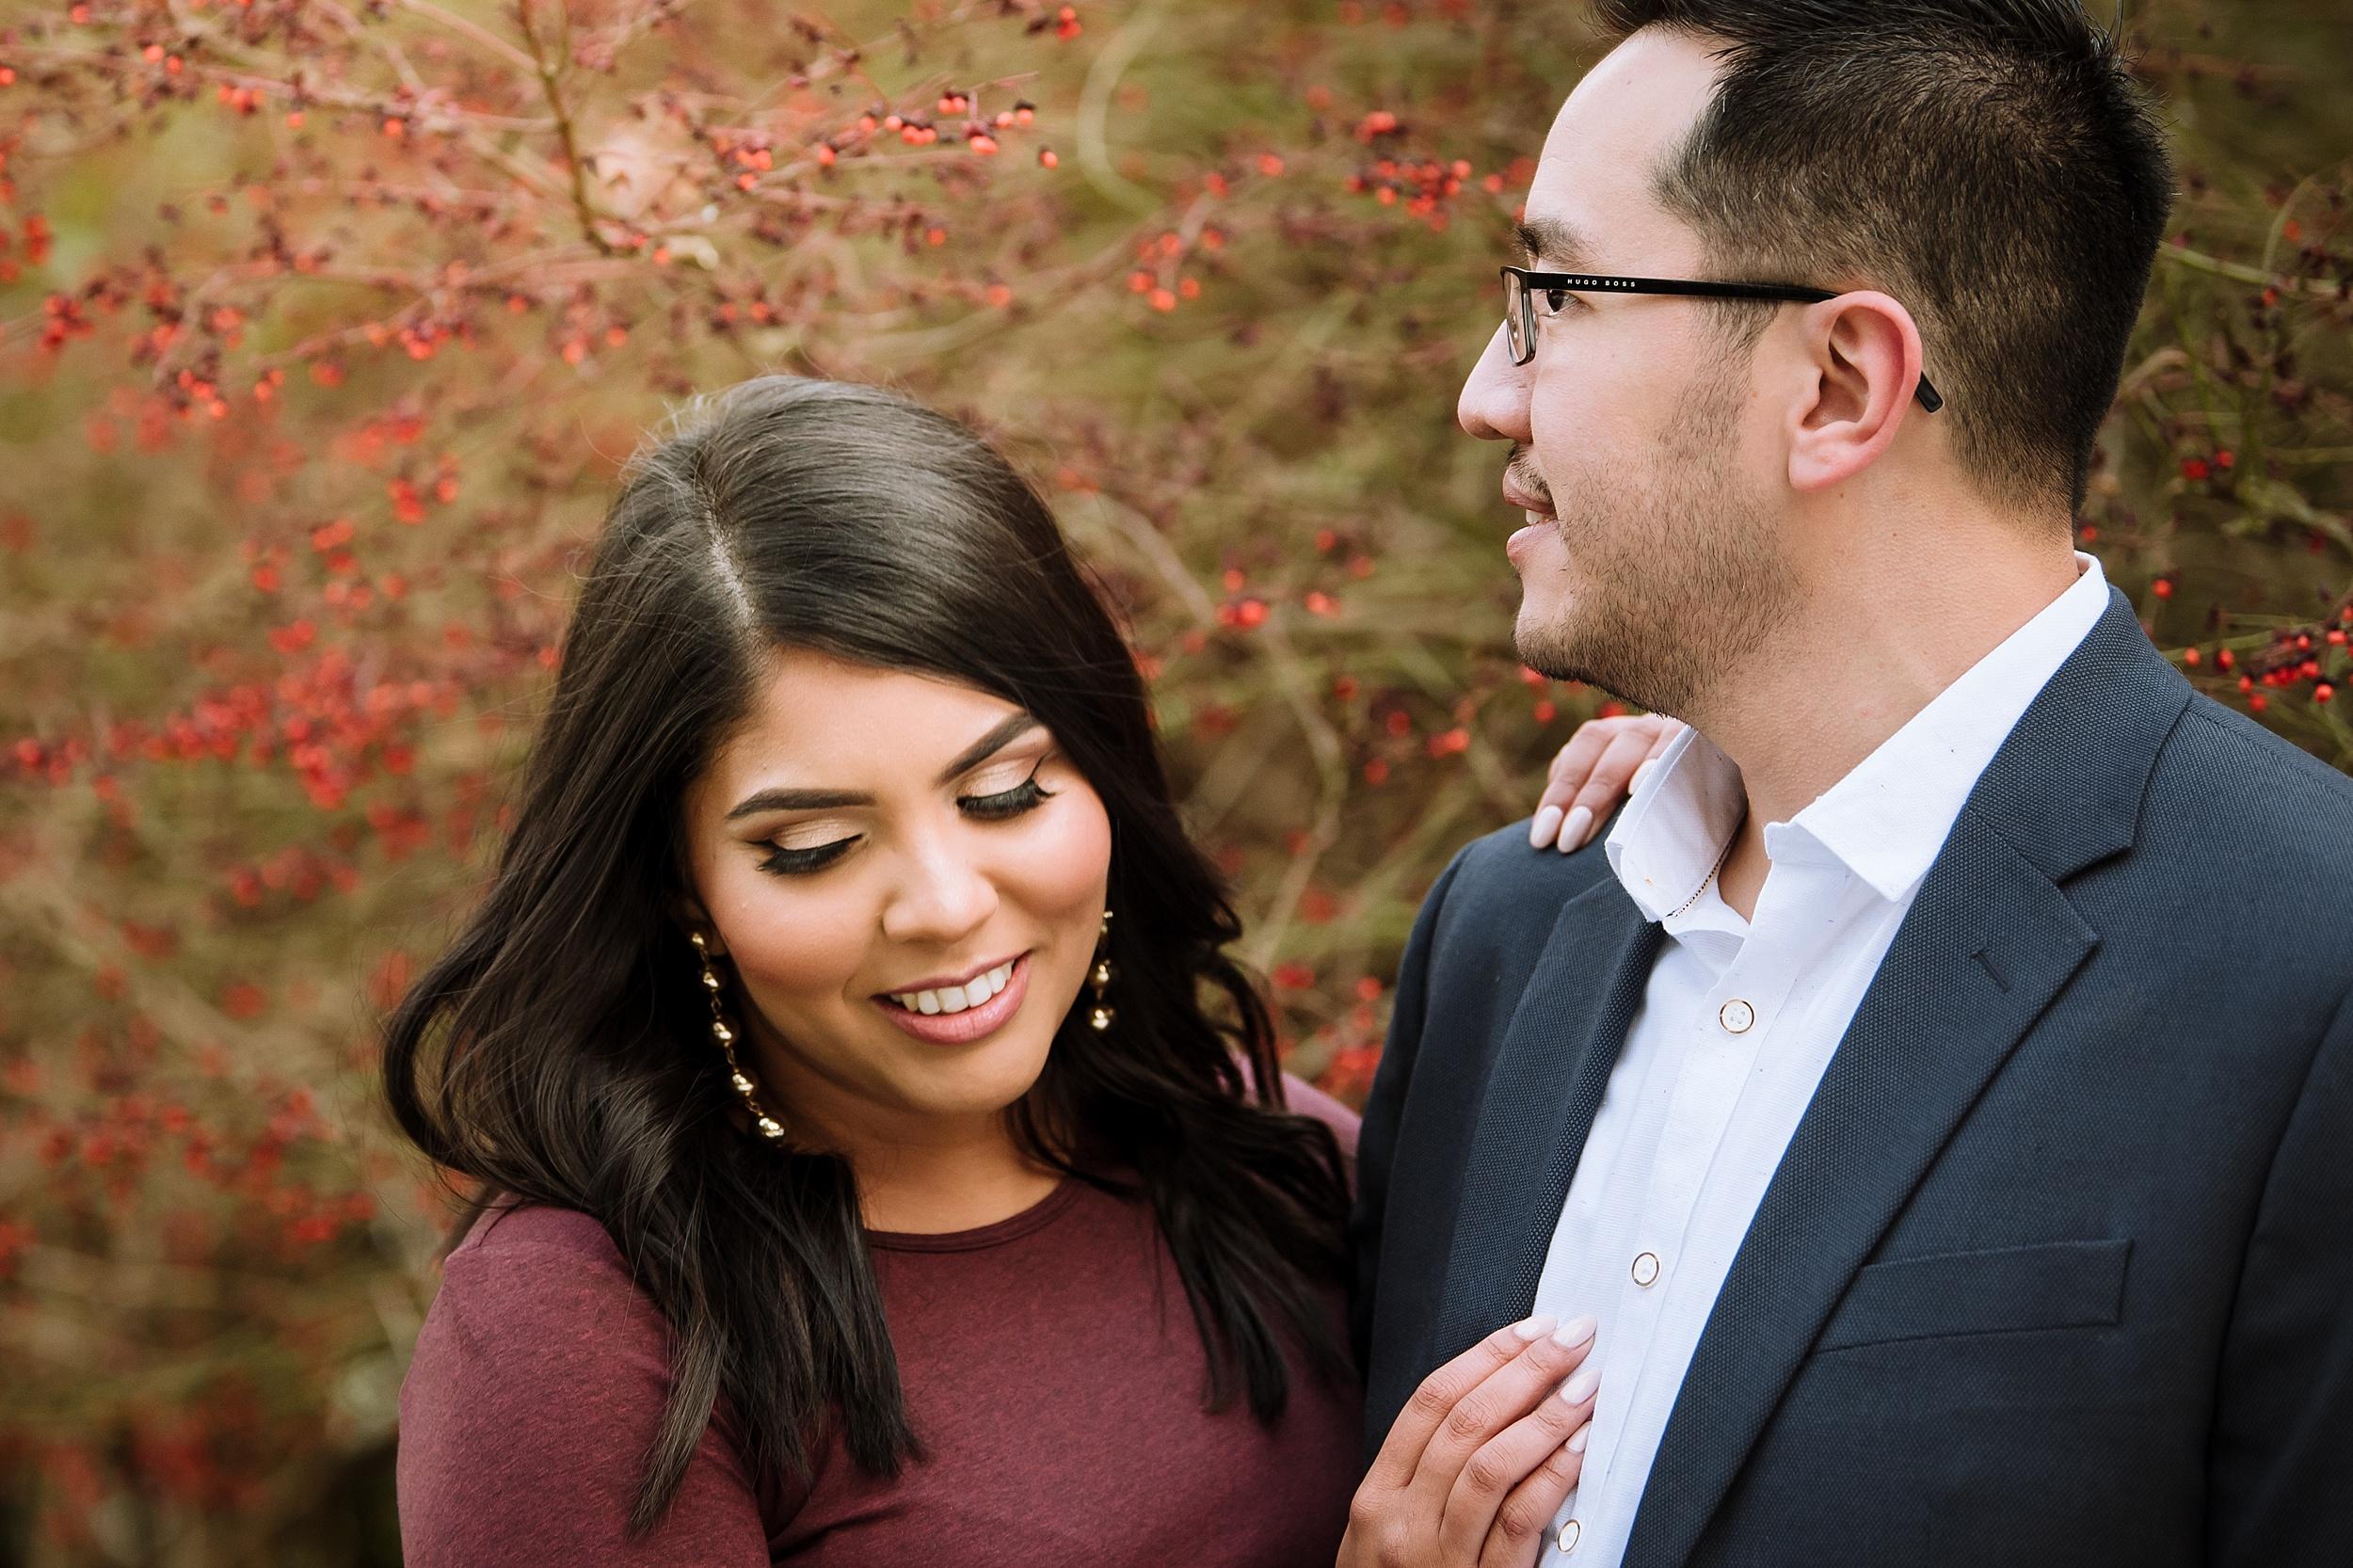 Alexander_Muir_Memorial_Gardens_Engagement_Shoot_Toronto_Wedding_Photographer_0014.jpg